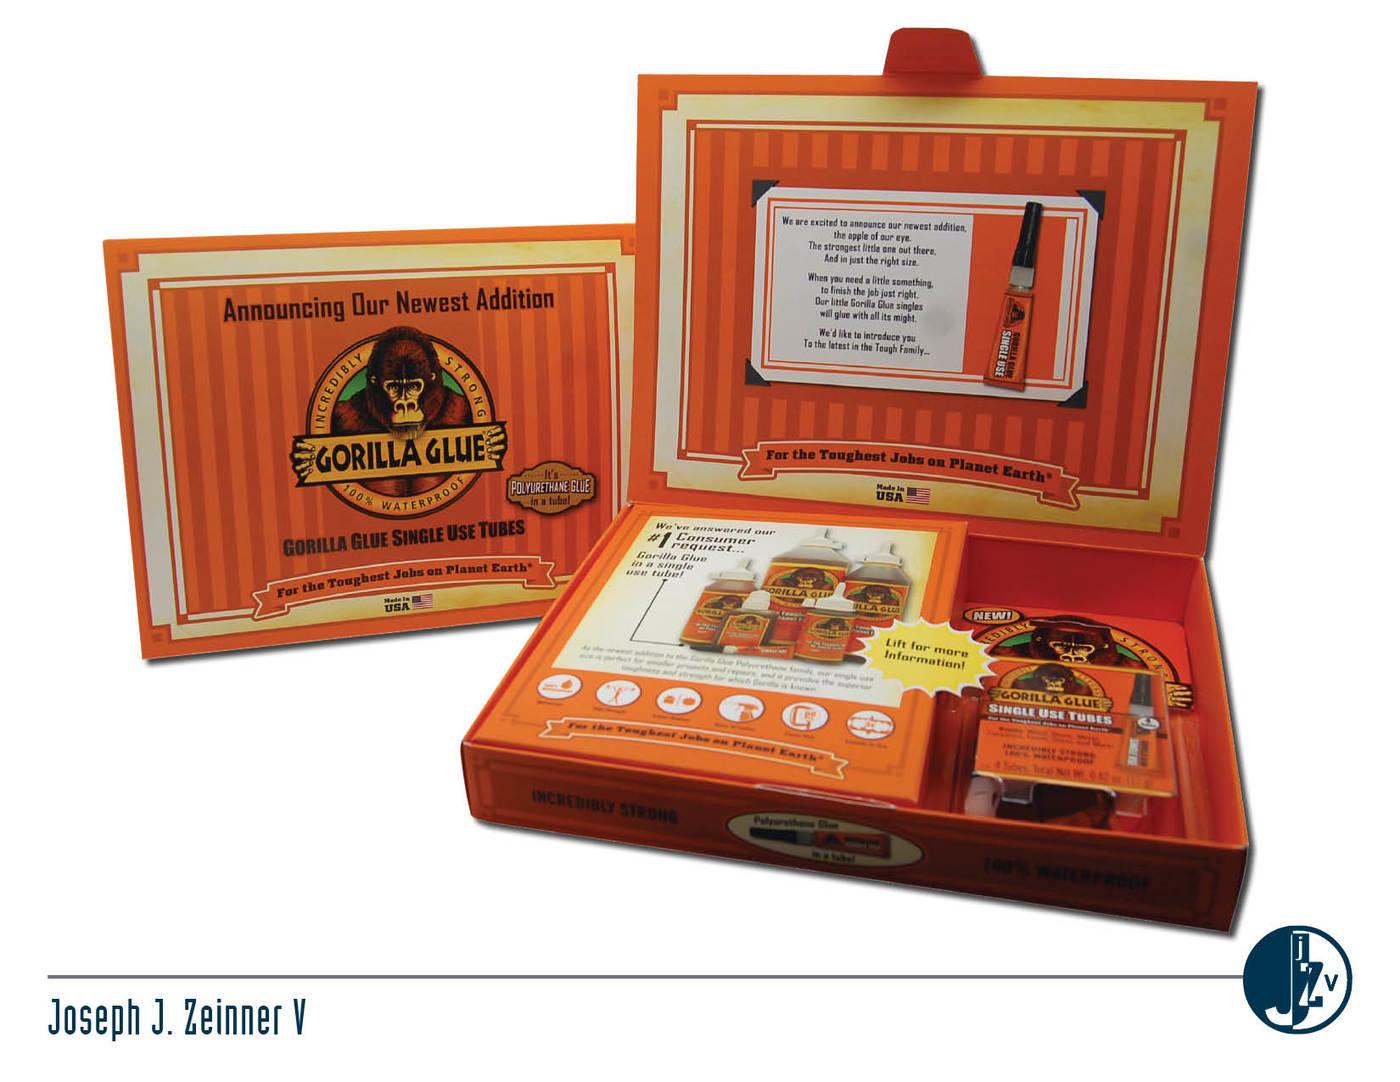 Gorilla Glue Singles Product Launch Kit by Joe Zeinner at